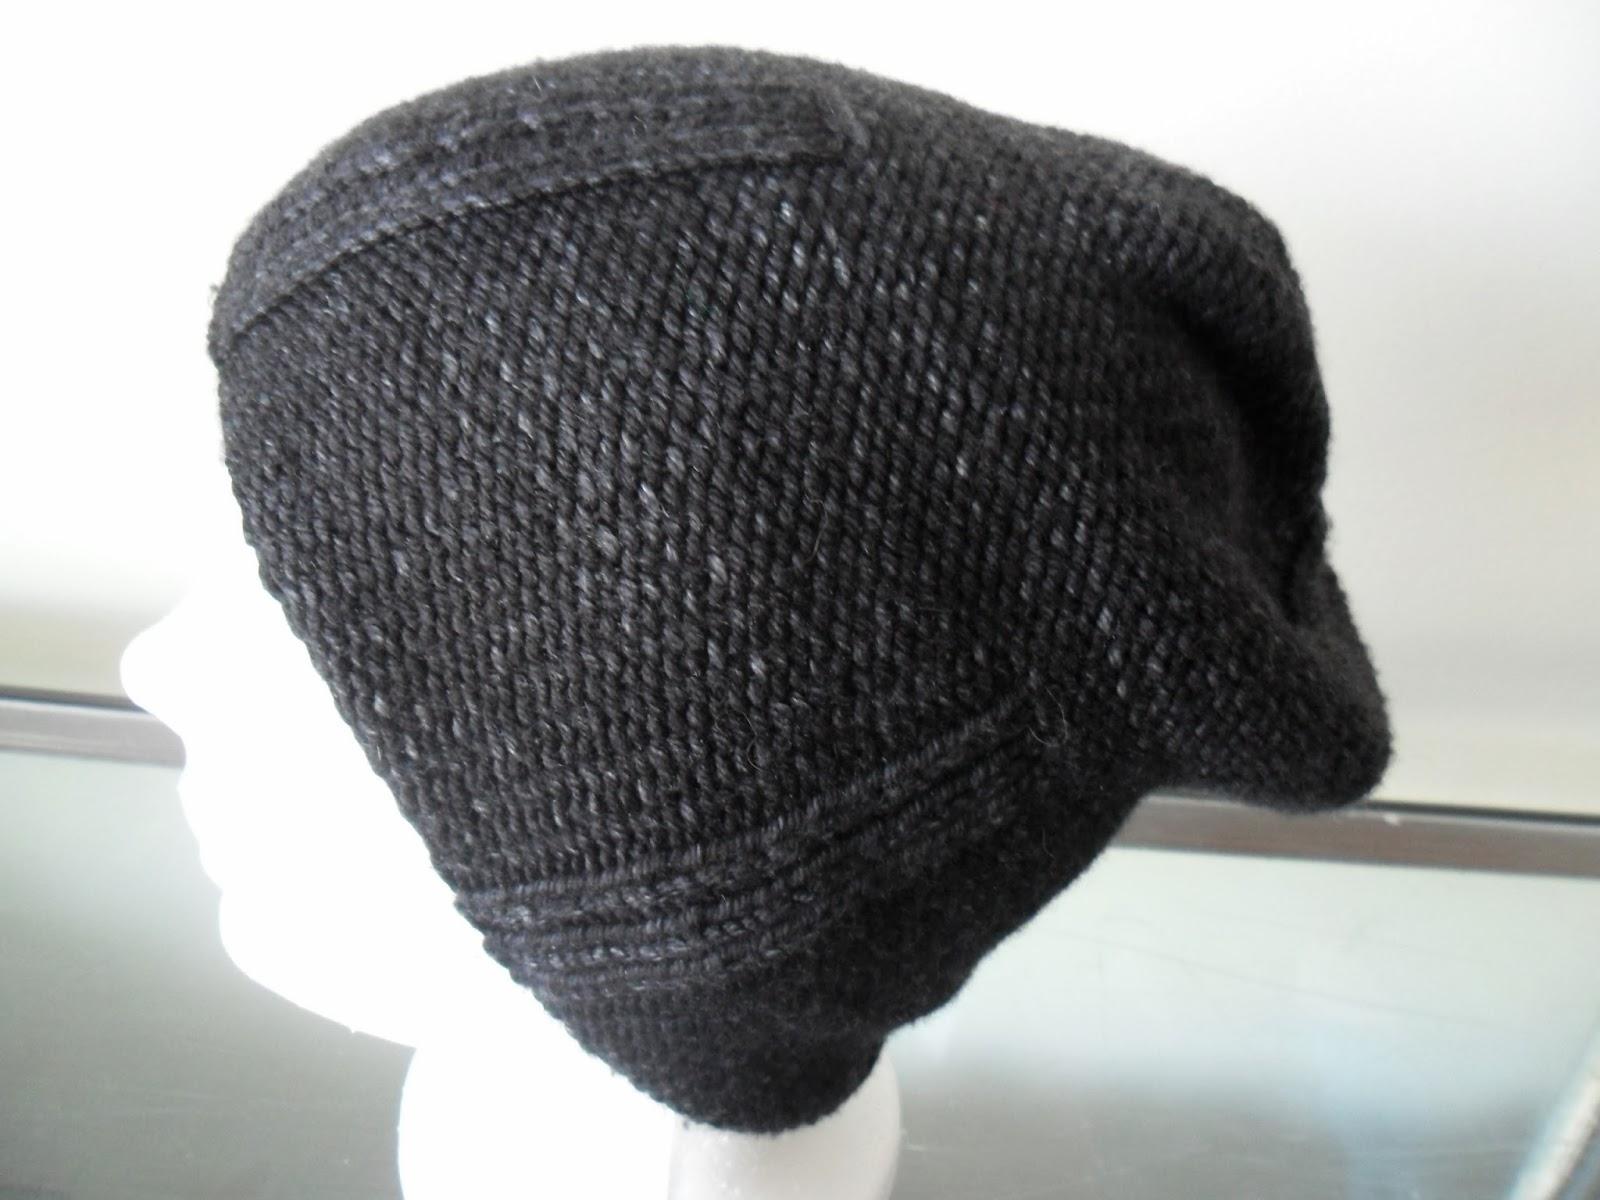 http://www.ravelry.com/projects/craftyminou/kami-hat-2